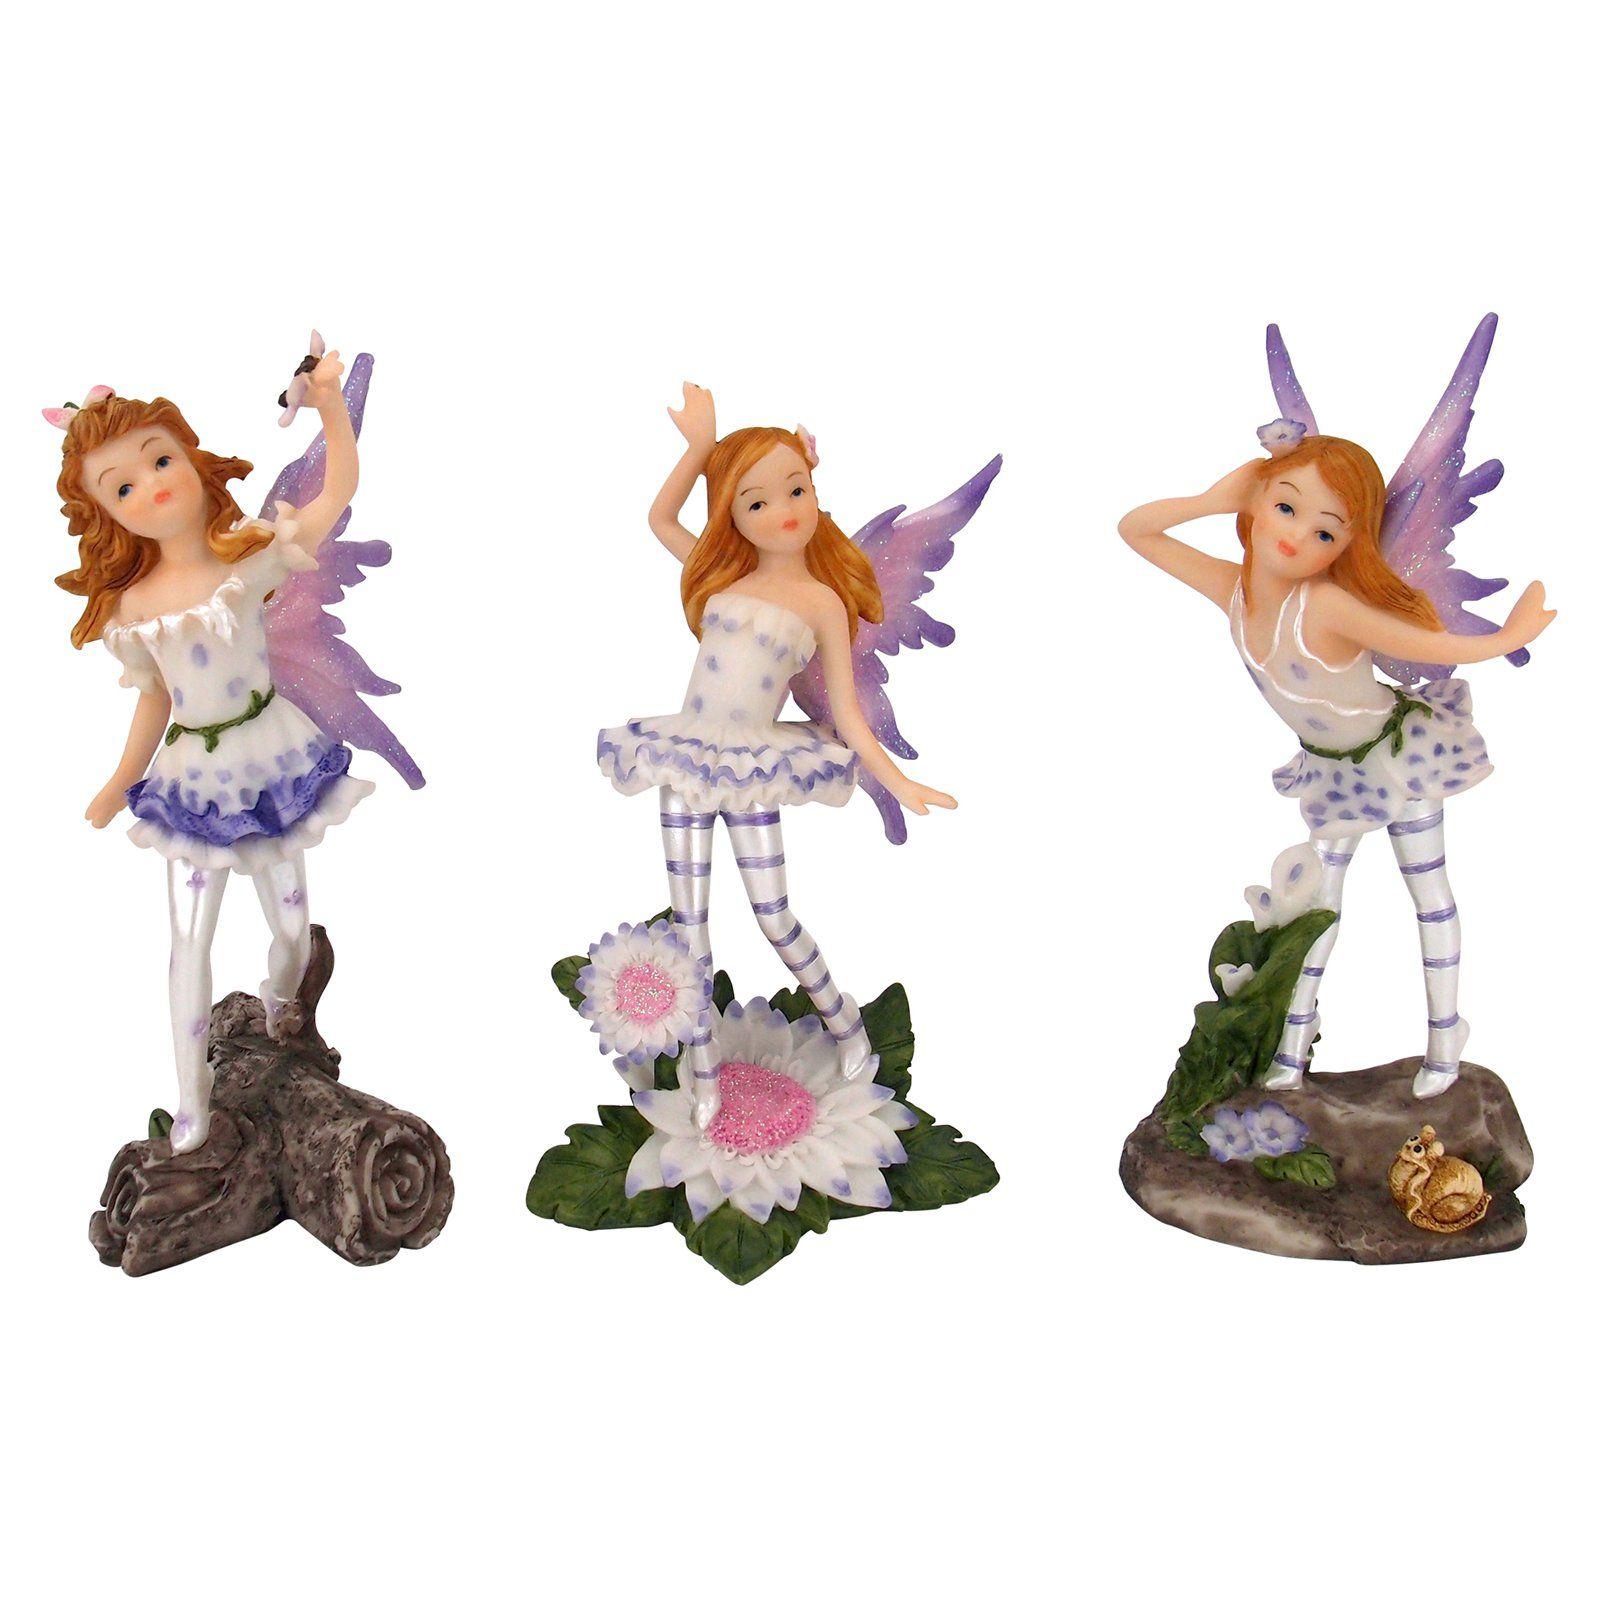 Design Toscano Honey Bunch Miniature Fairy Garden Statue - Set of 3 - QS9233925